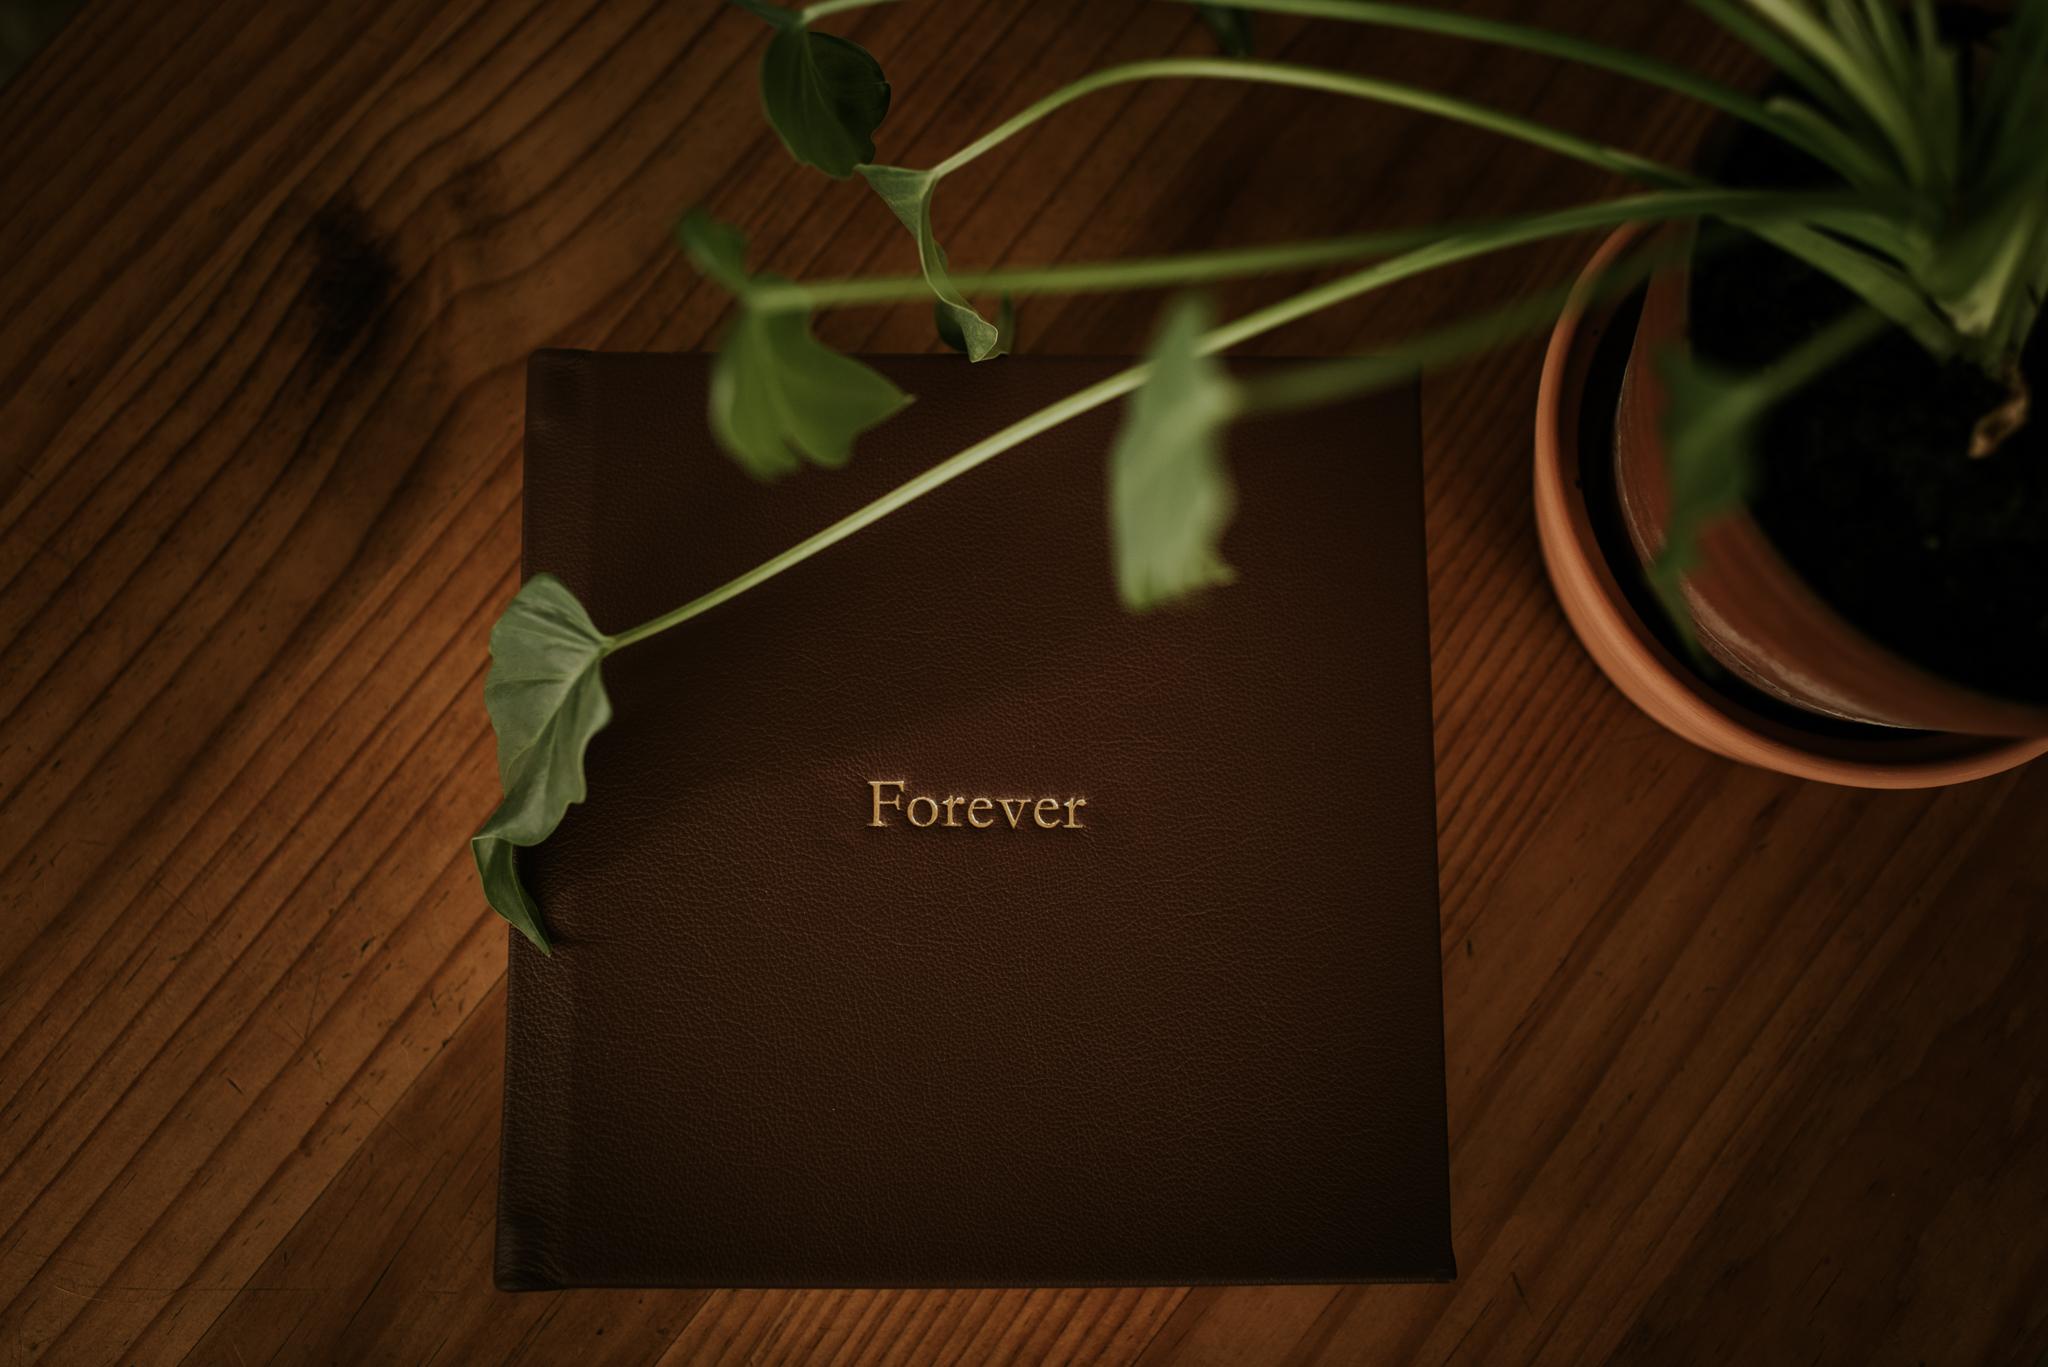 Wedding Album (8x8%22)_14Mar2019_social sharing-3.jpg